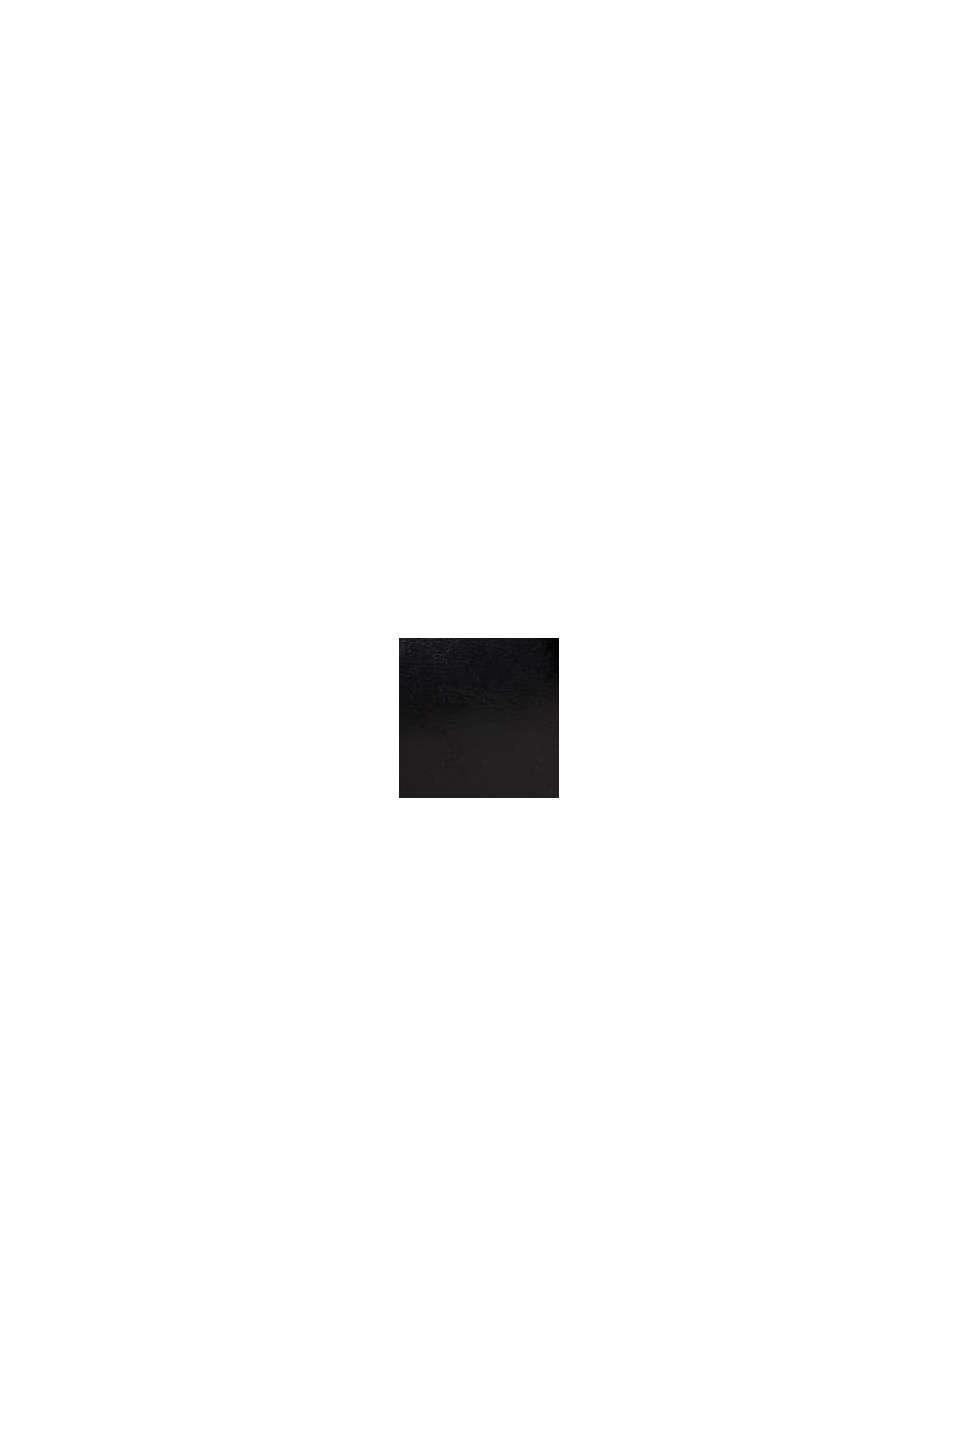 Sandali con cinturino in similpelle, BLACK, swatch